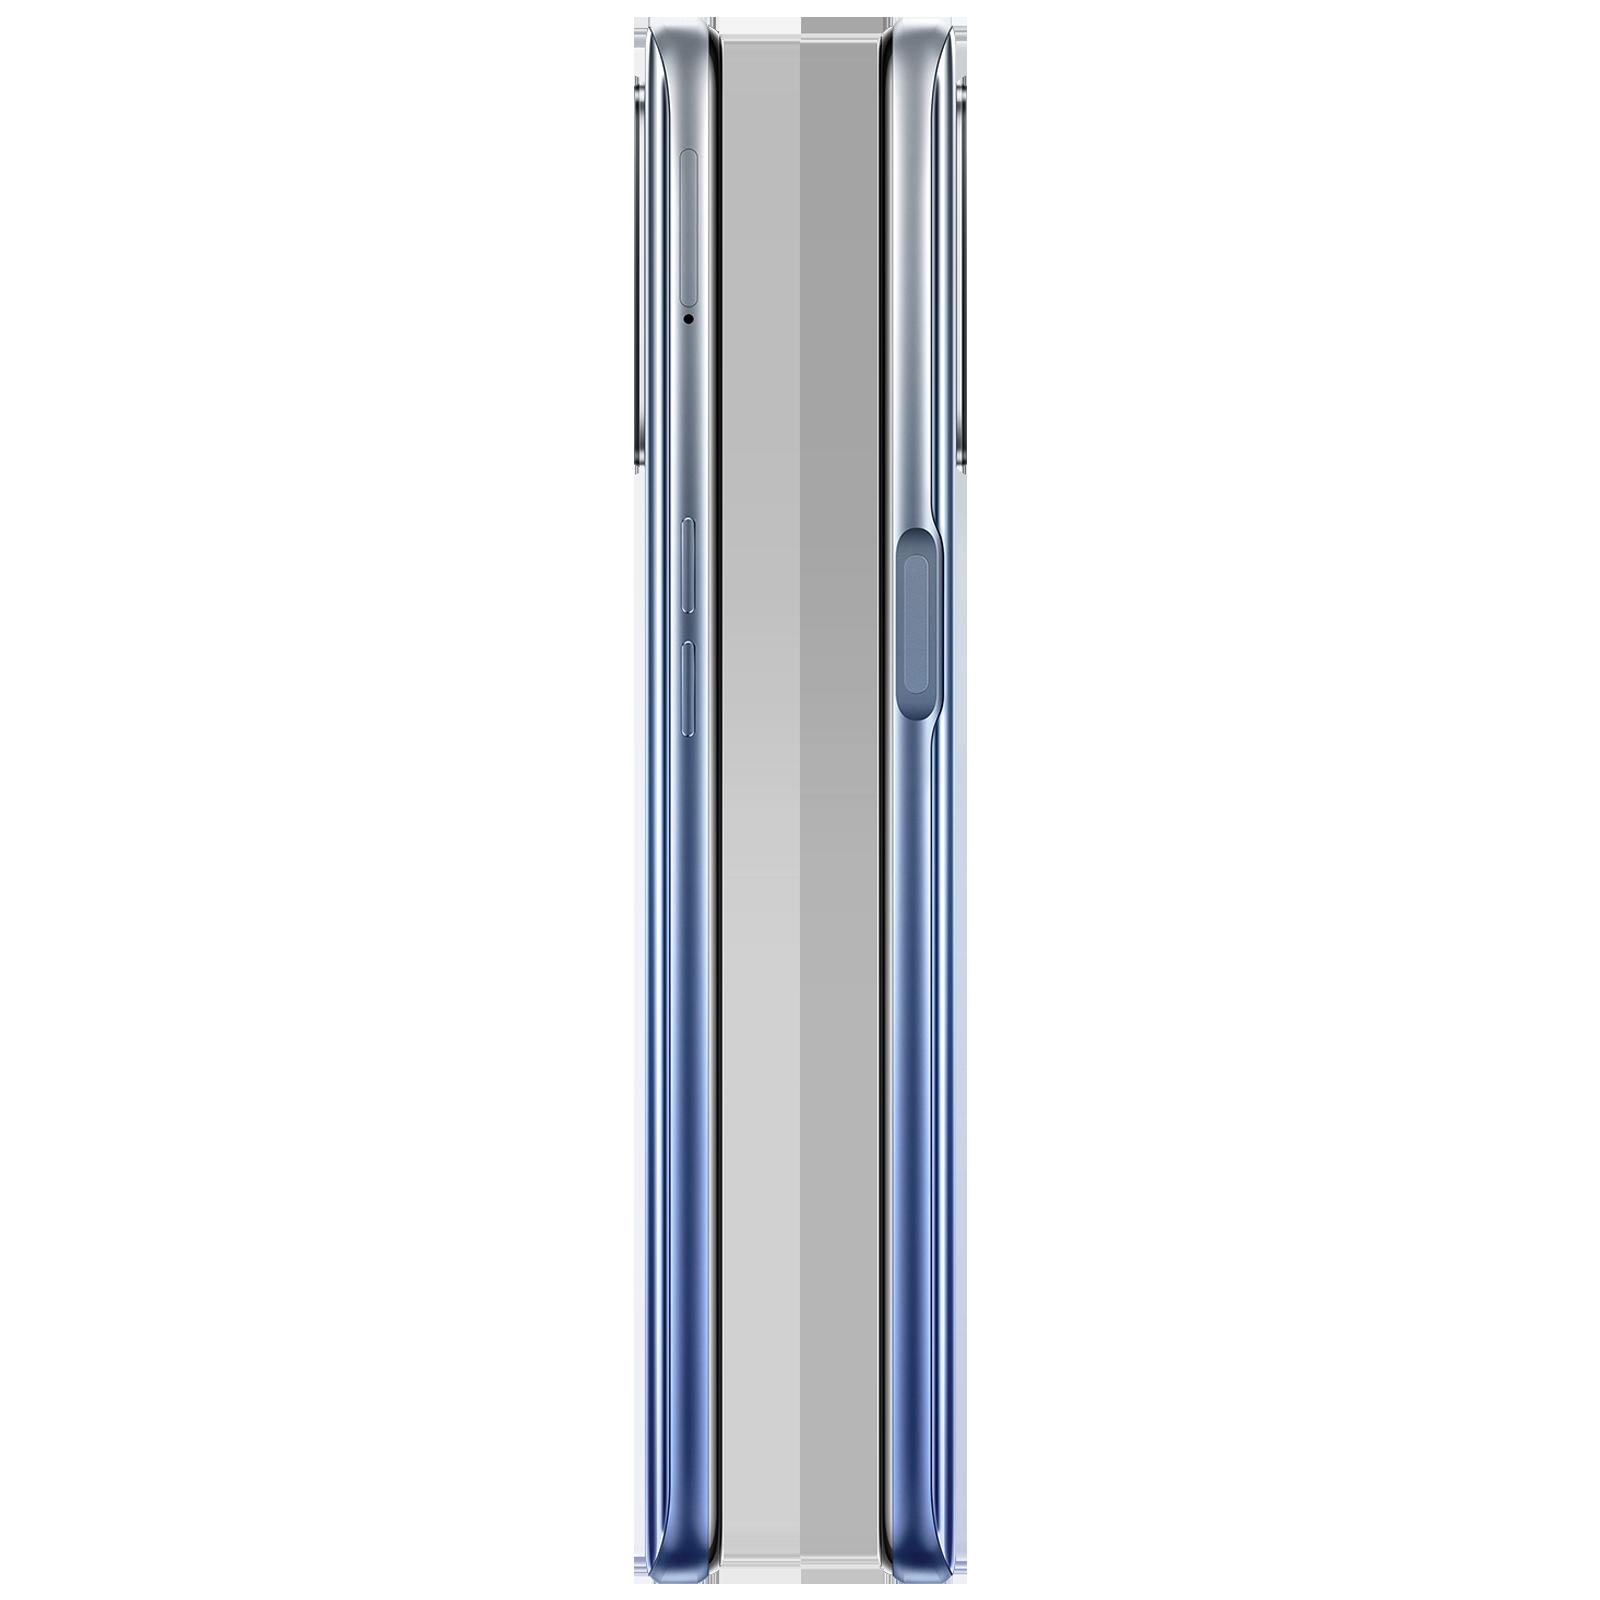 Oppo A53s (128GB ROM, 8GB RAM, CPH2321, Crystal Blue) 5